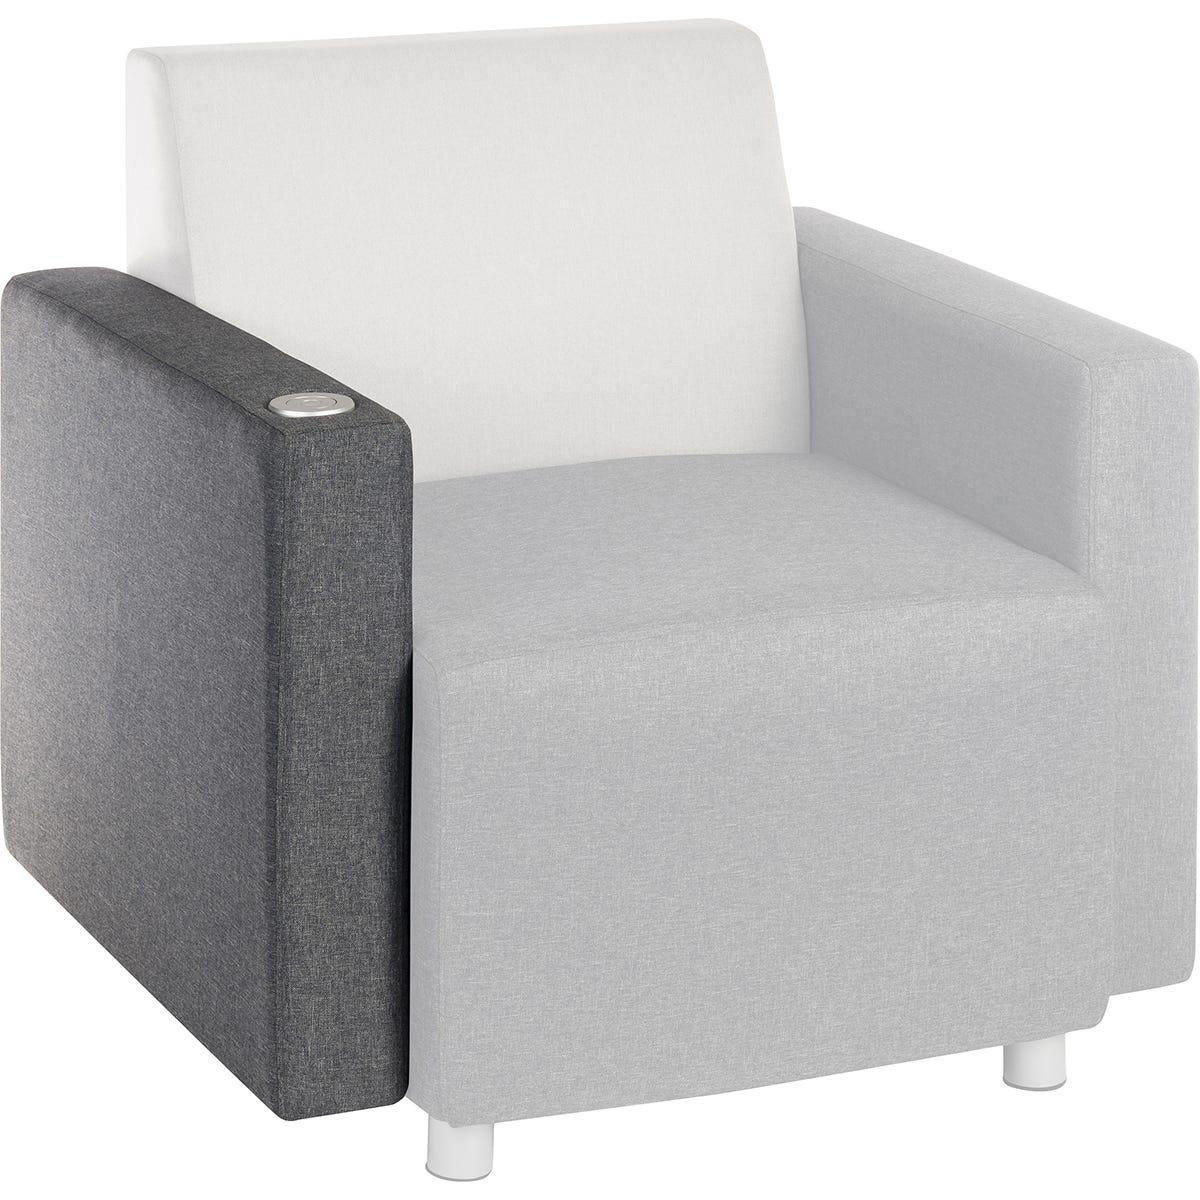 Teknik Cube Modular Reception Sofa - Dark Grey Right Hand Chair